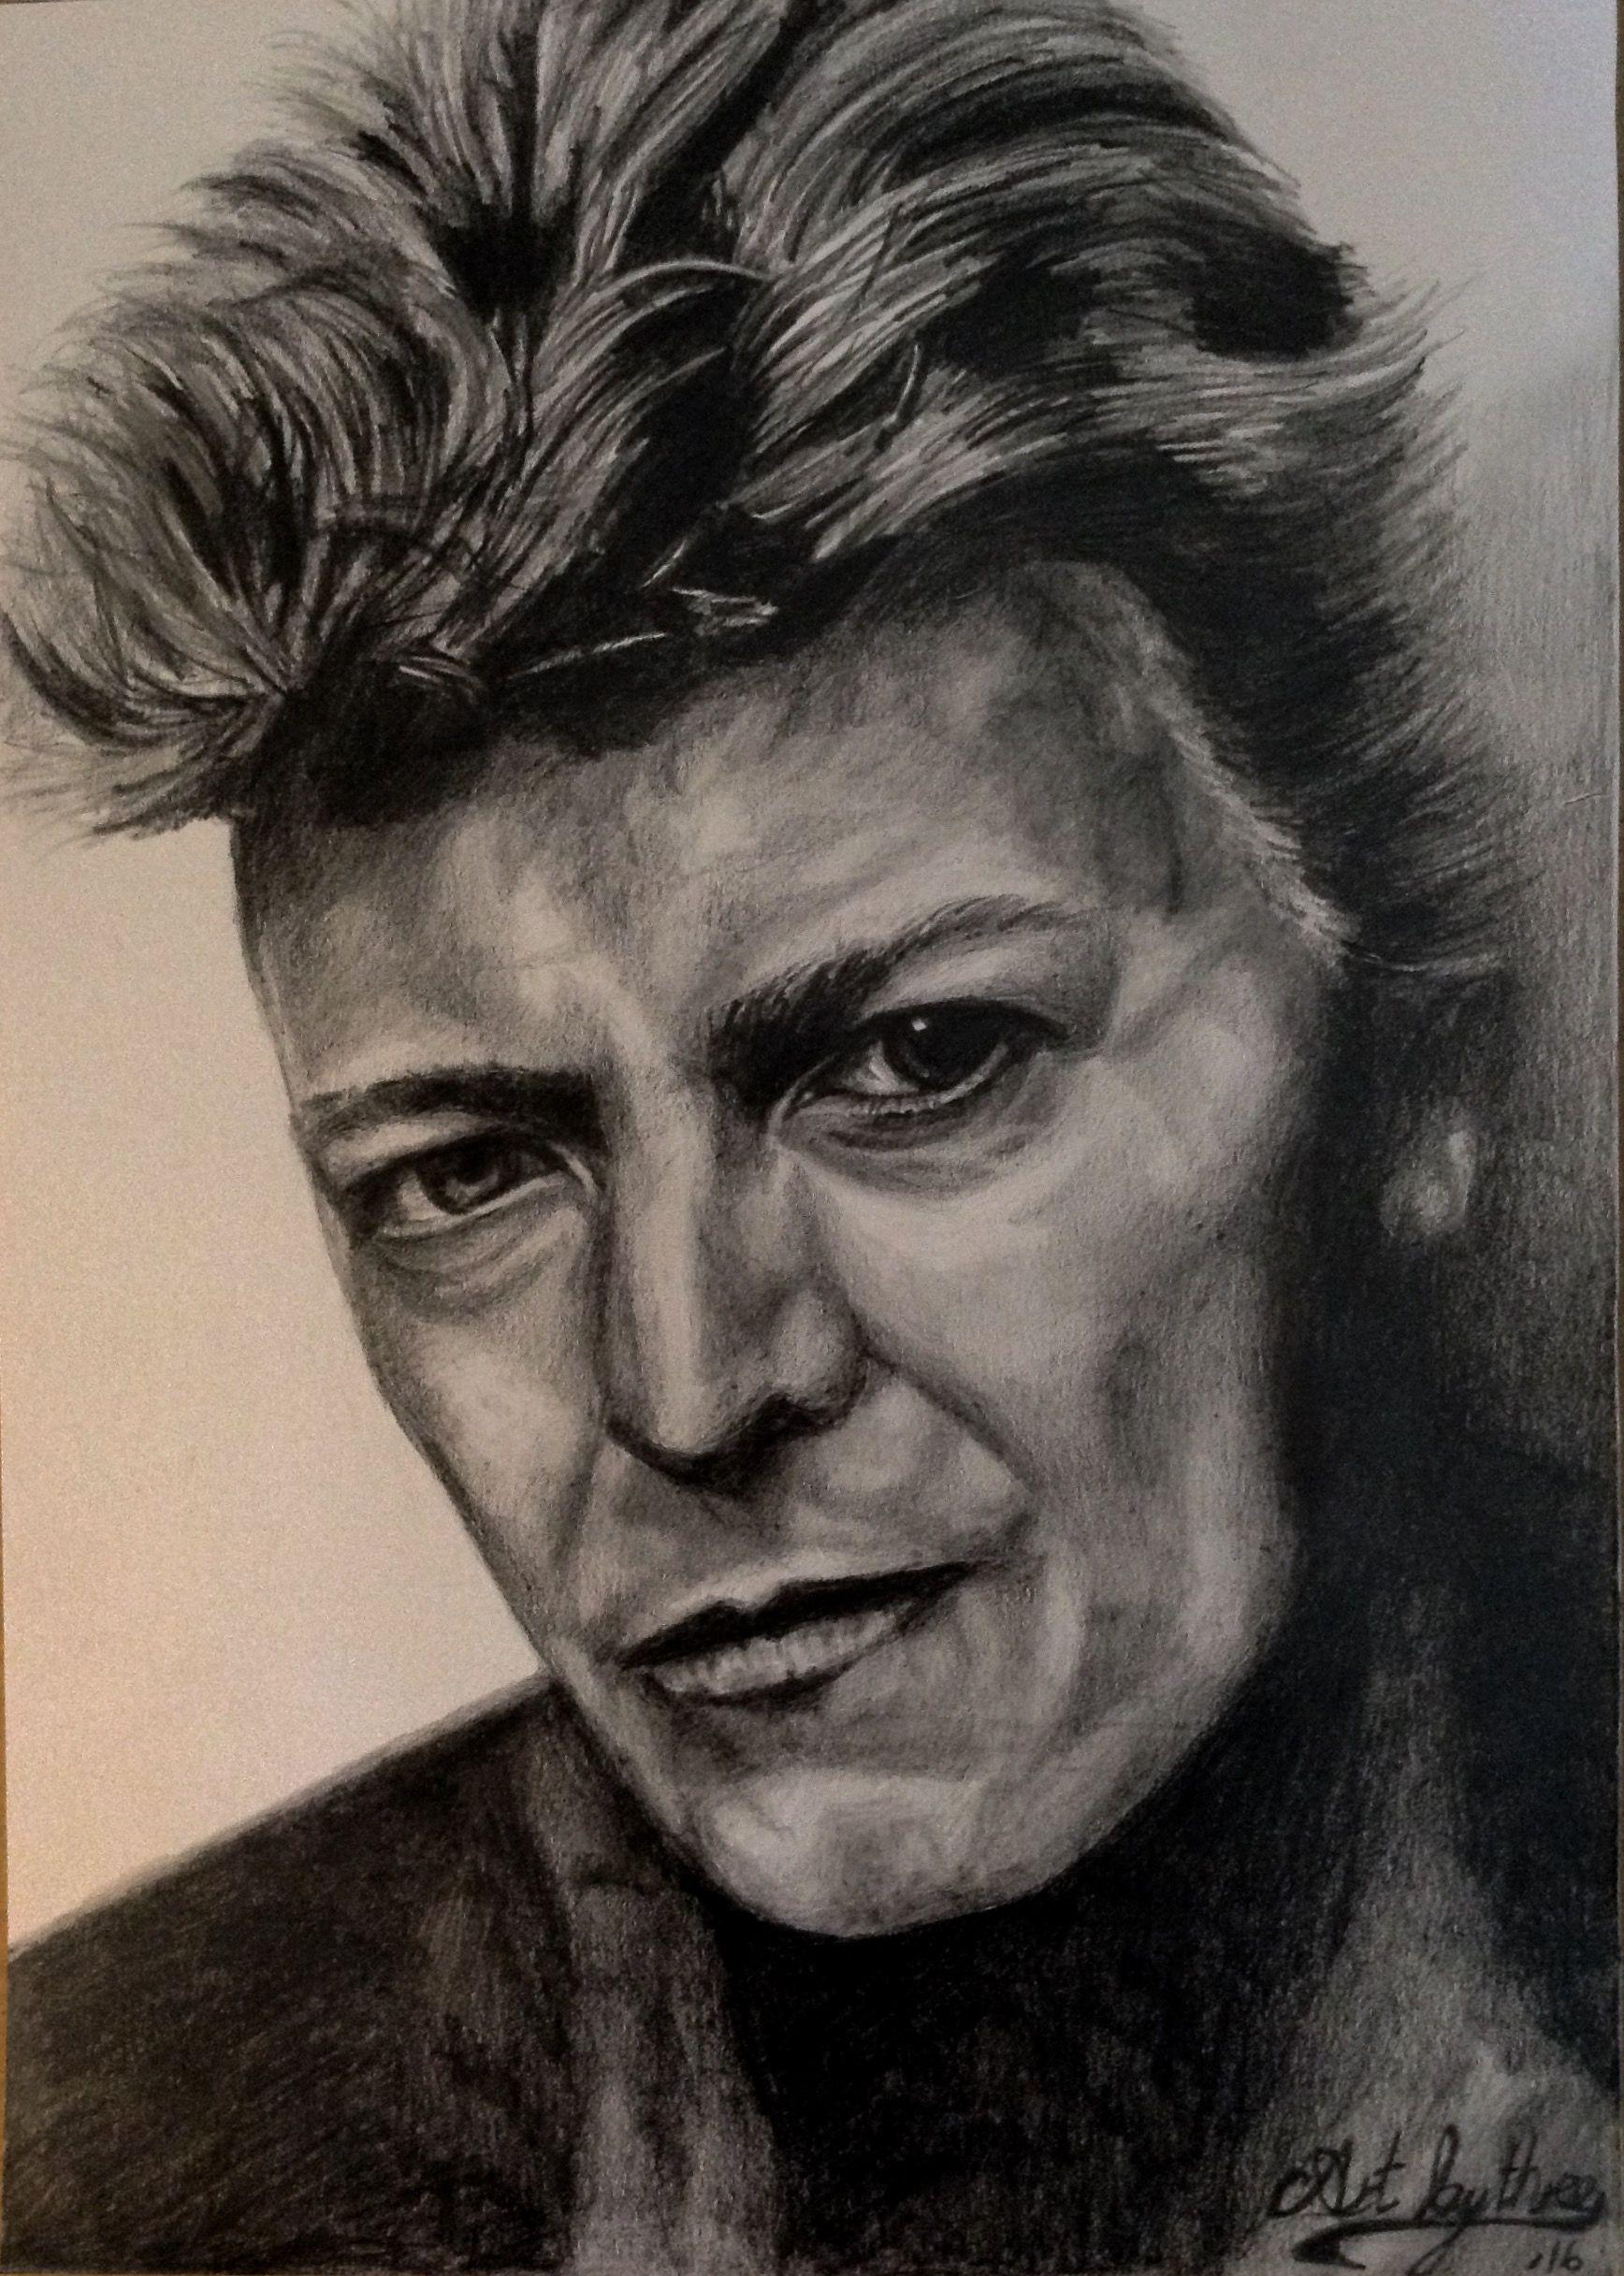 David Bowie Sketch